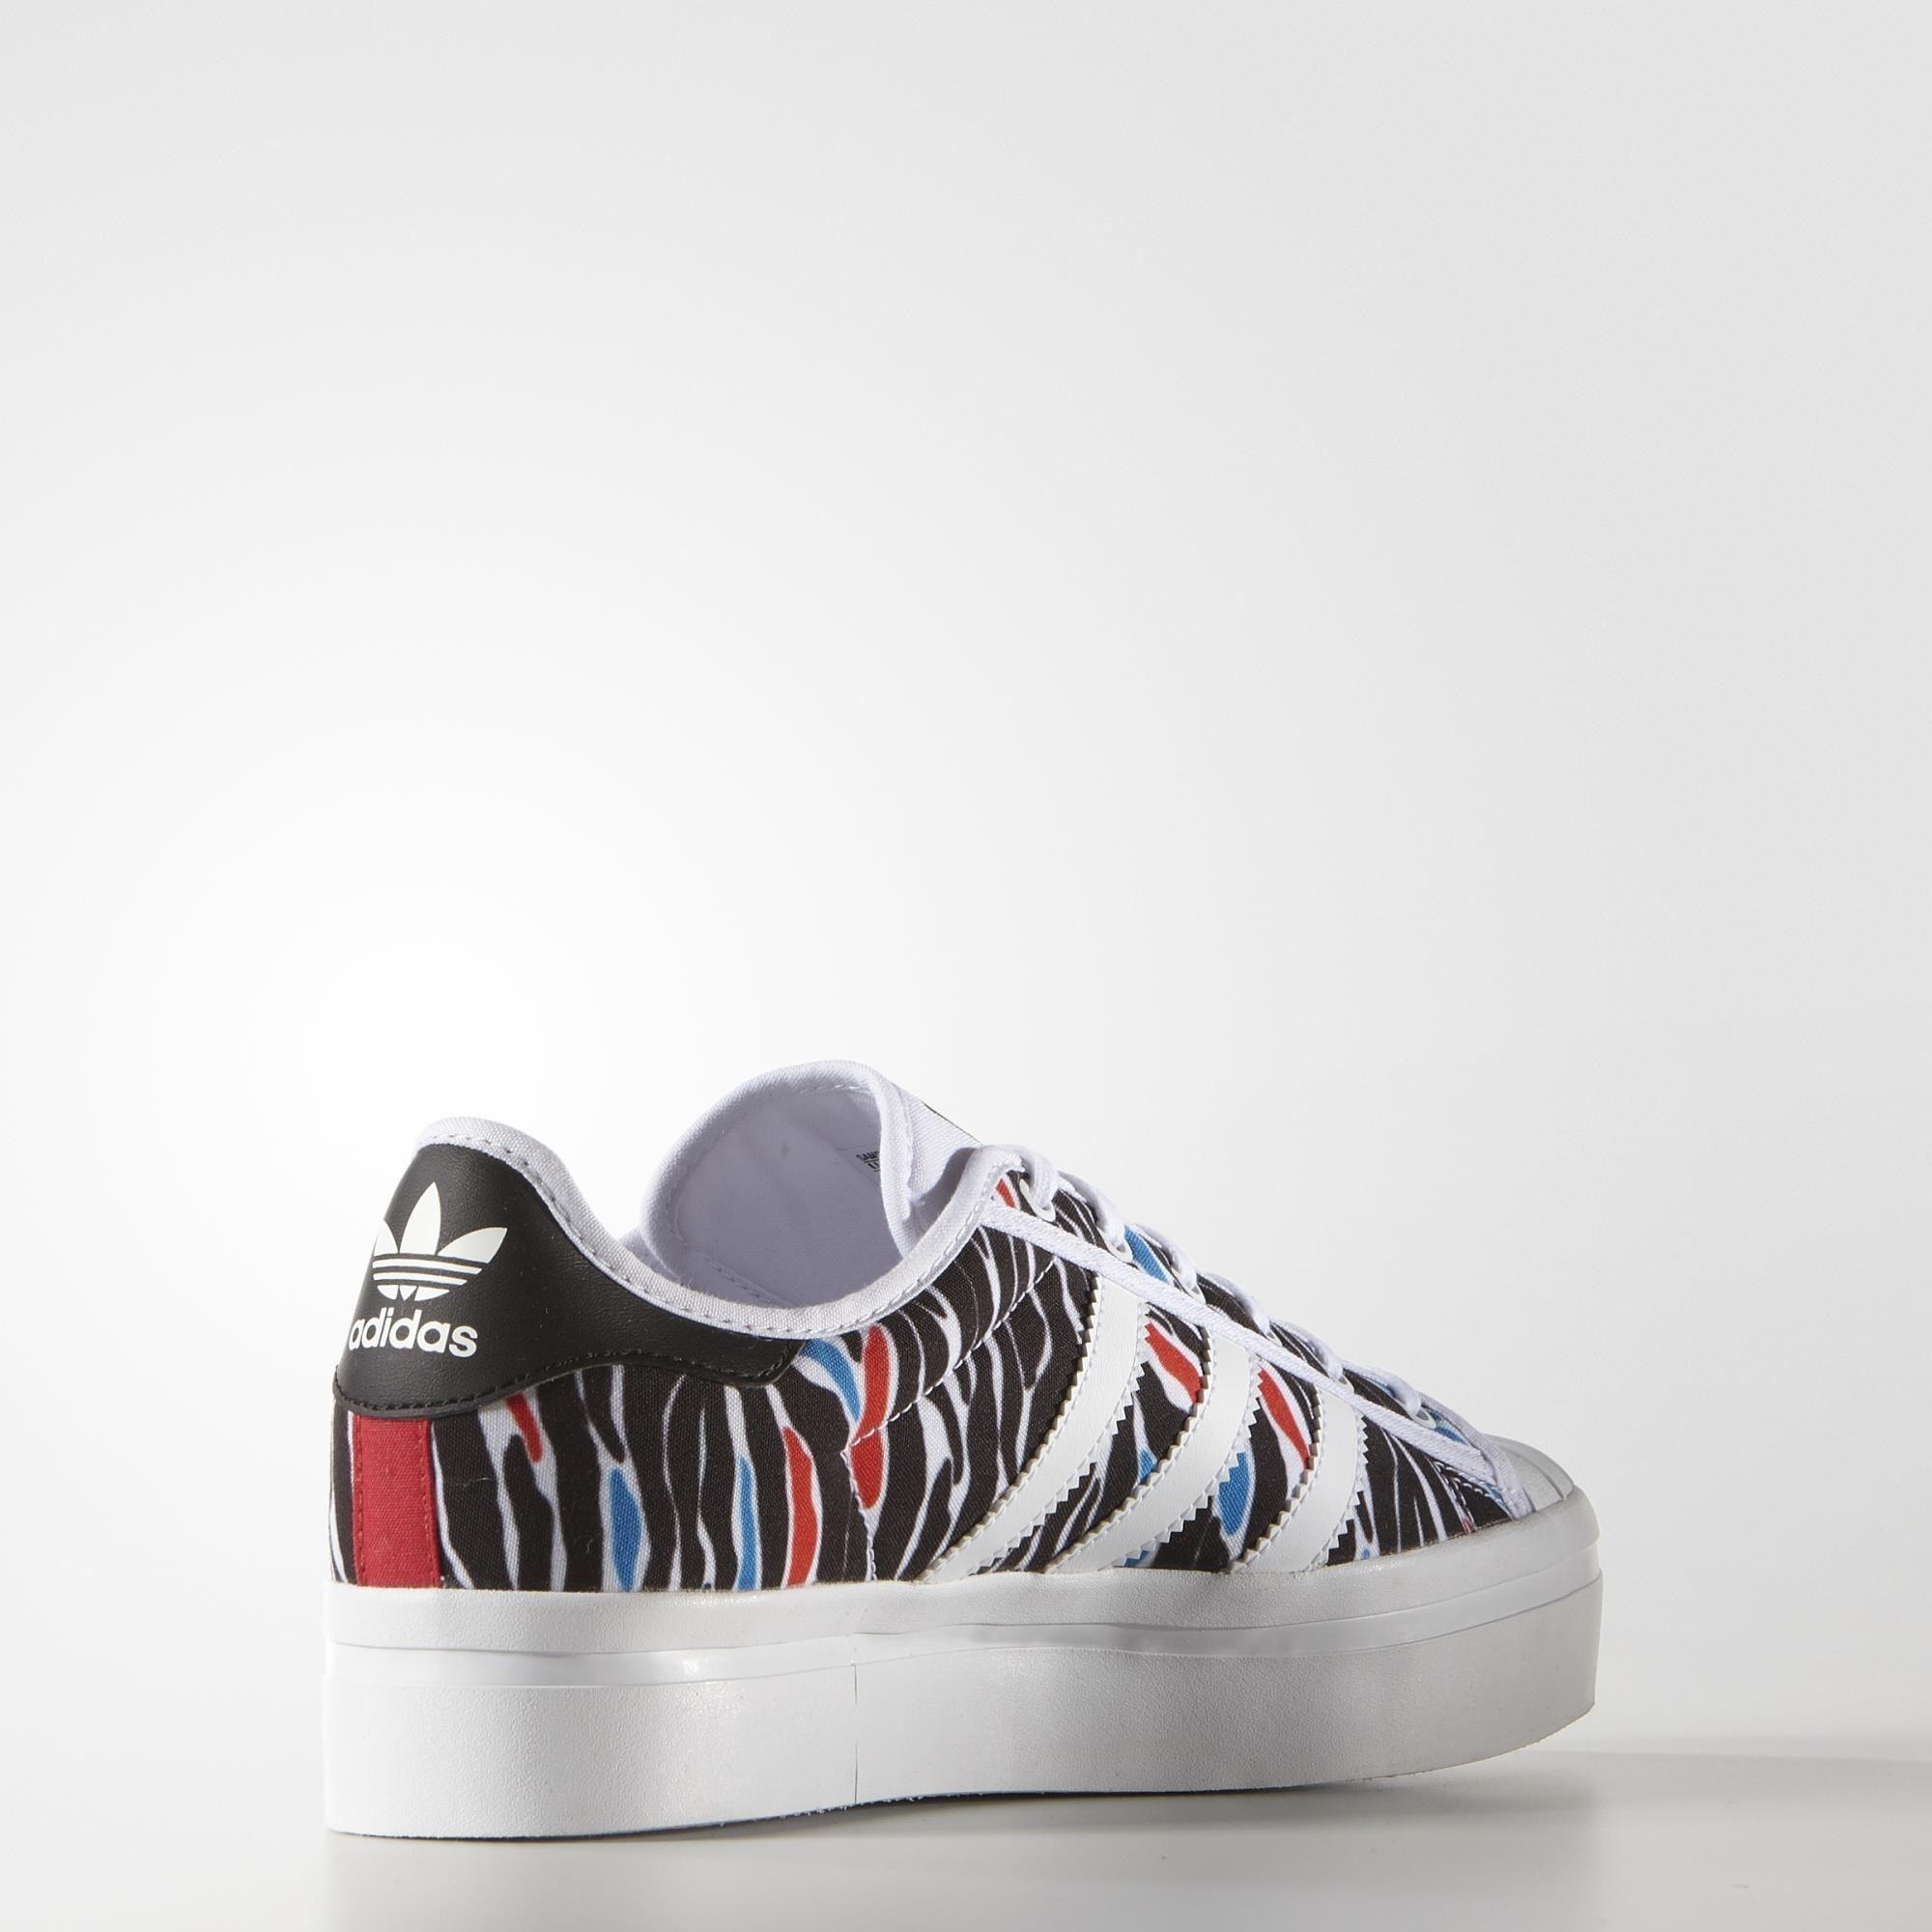 adidas superstar zebra print